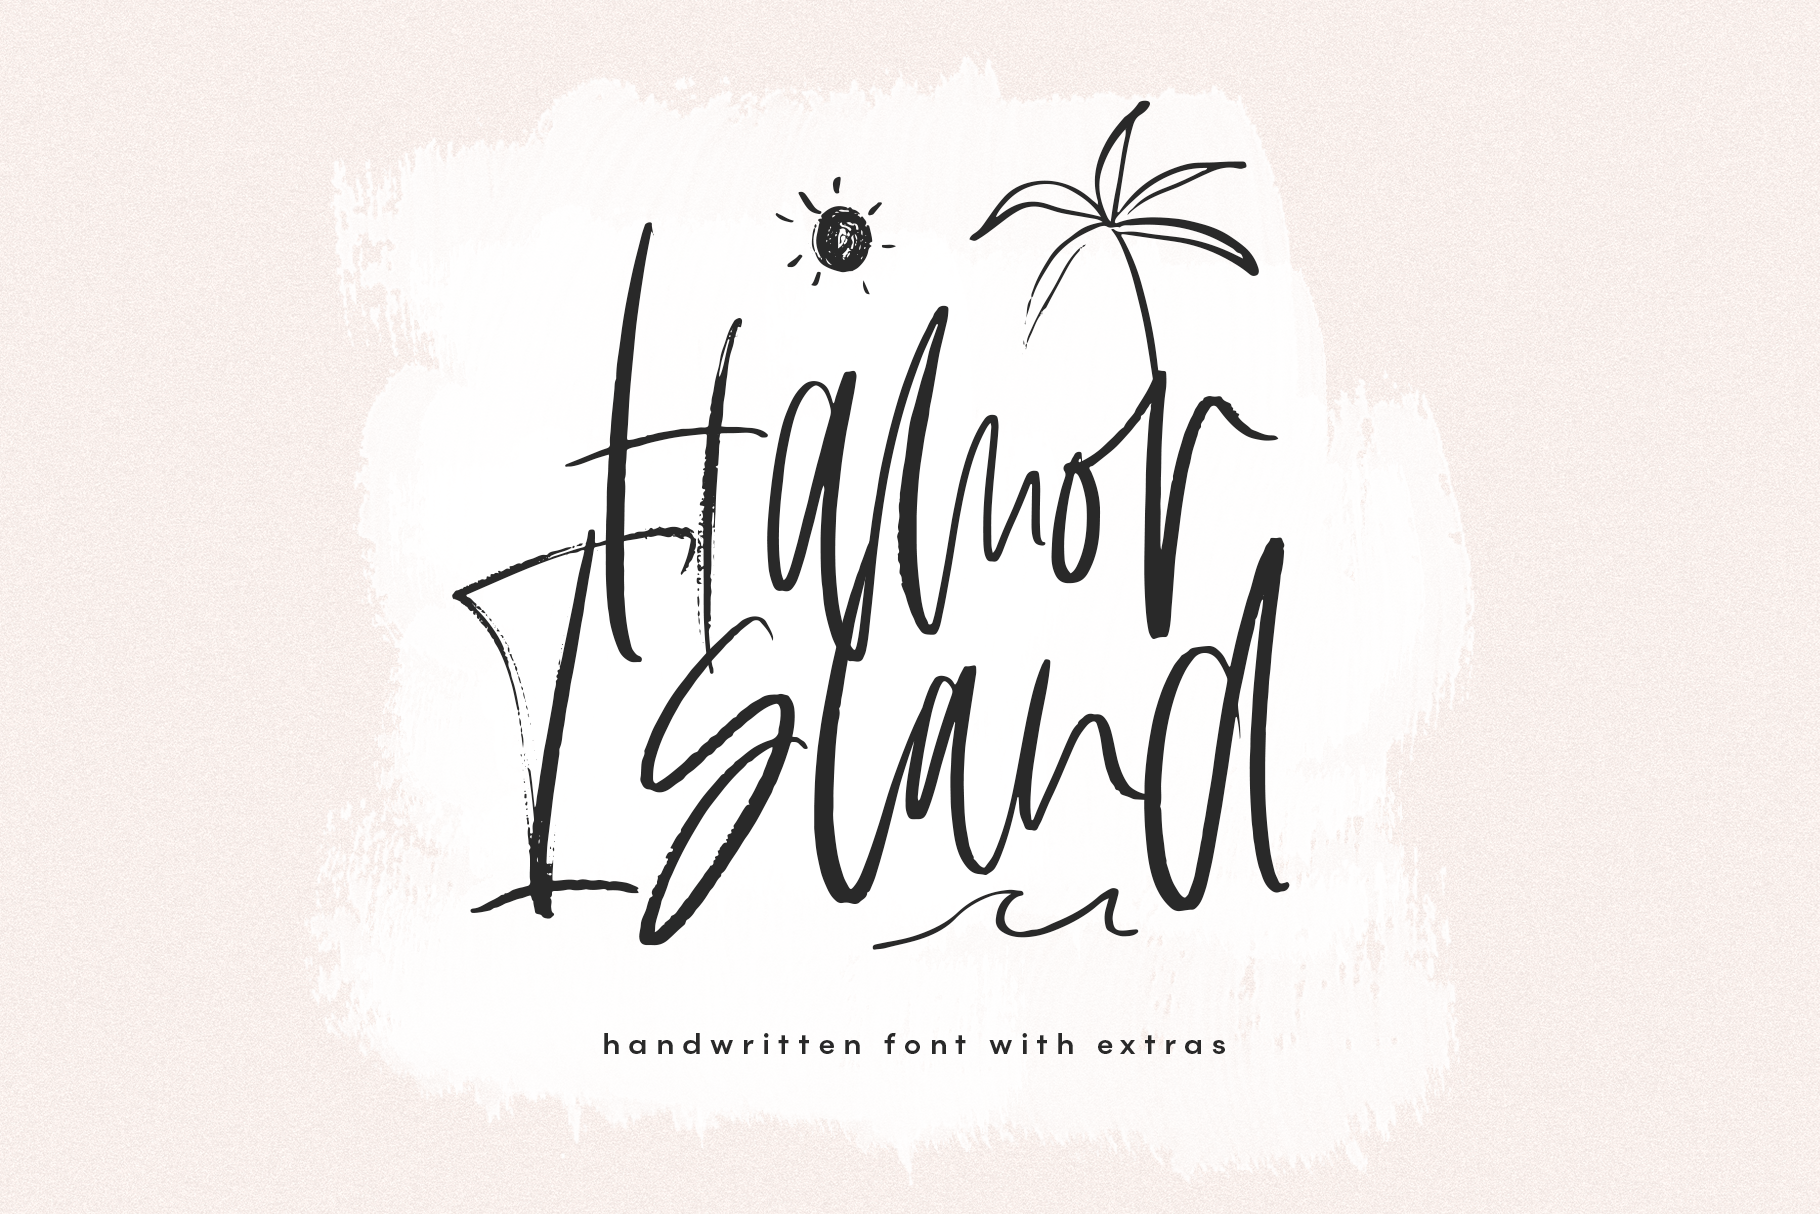 Hamor Island Handwritten Script Font With Extras 269785 Regular Font Bundles Handwritten Script Font Script Fonts Fonts